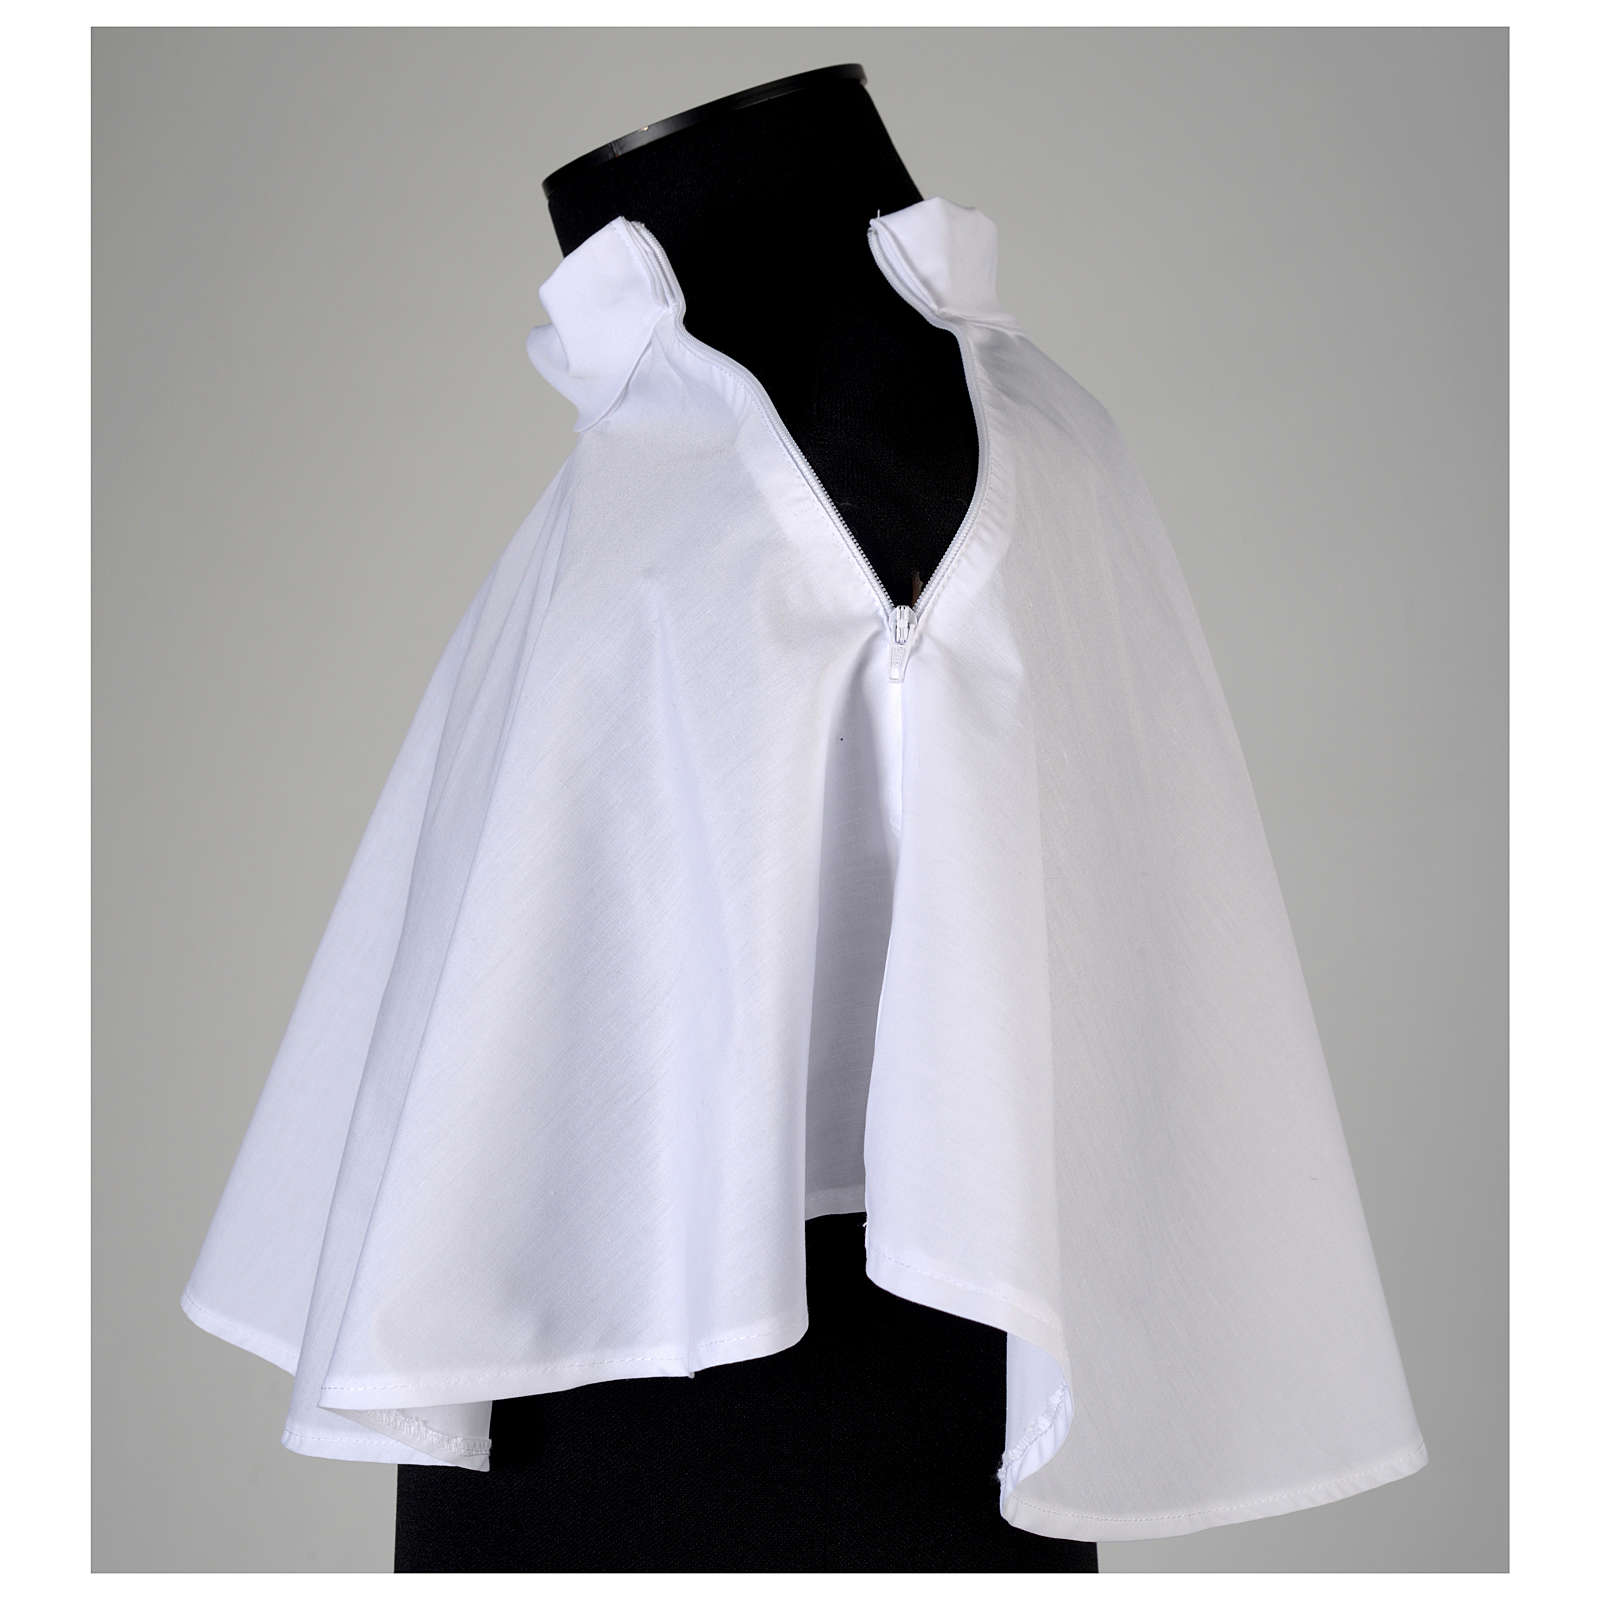 Amito blanco con cremallera hombro mixto algodón 4